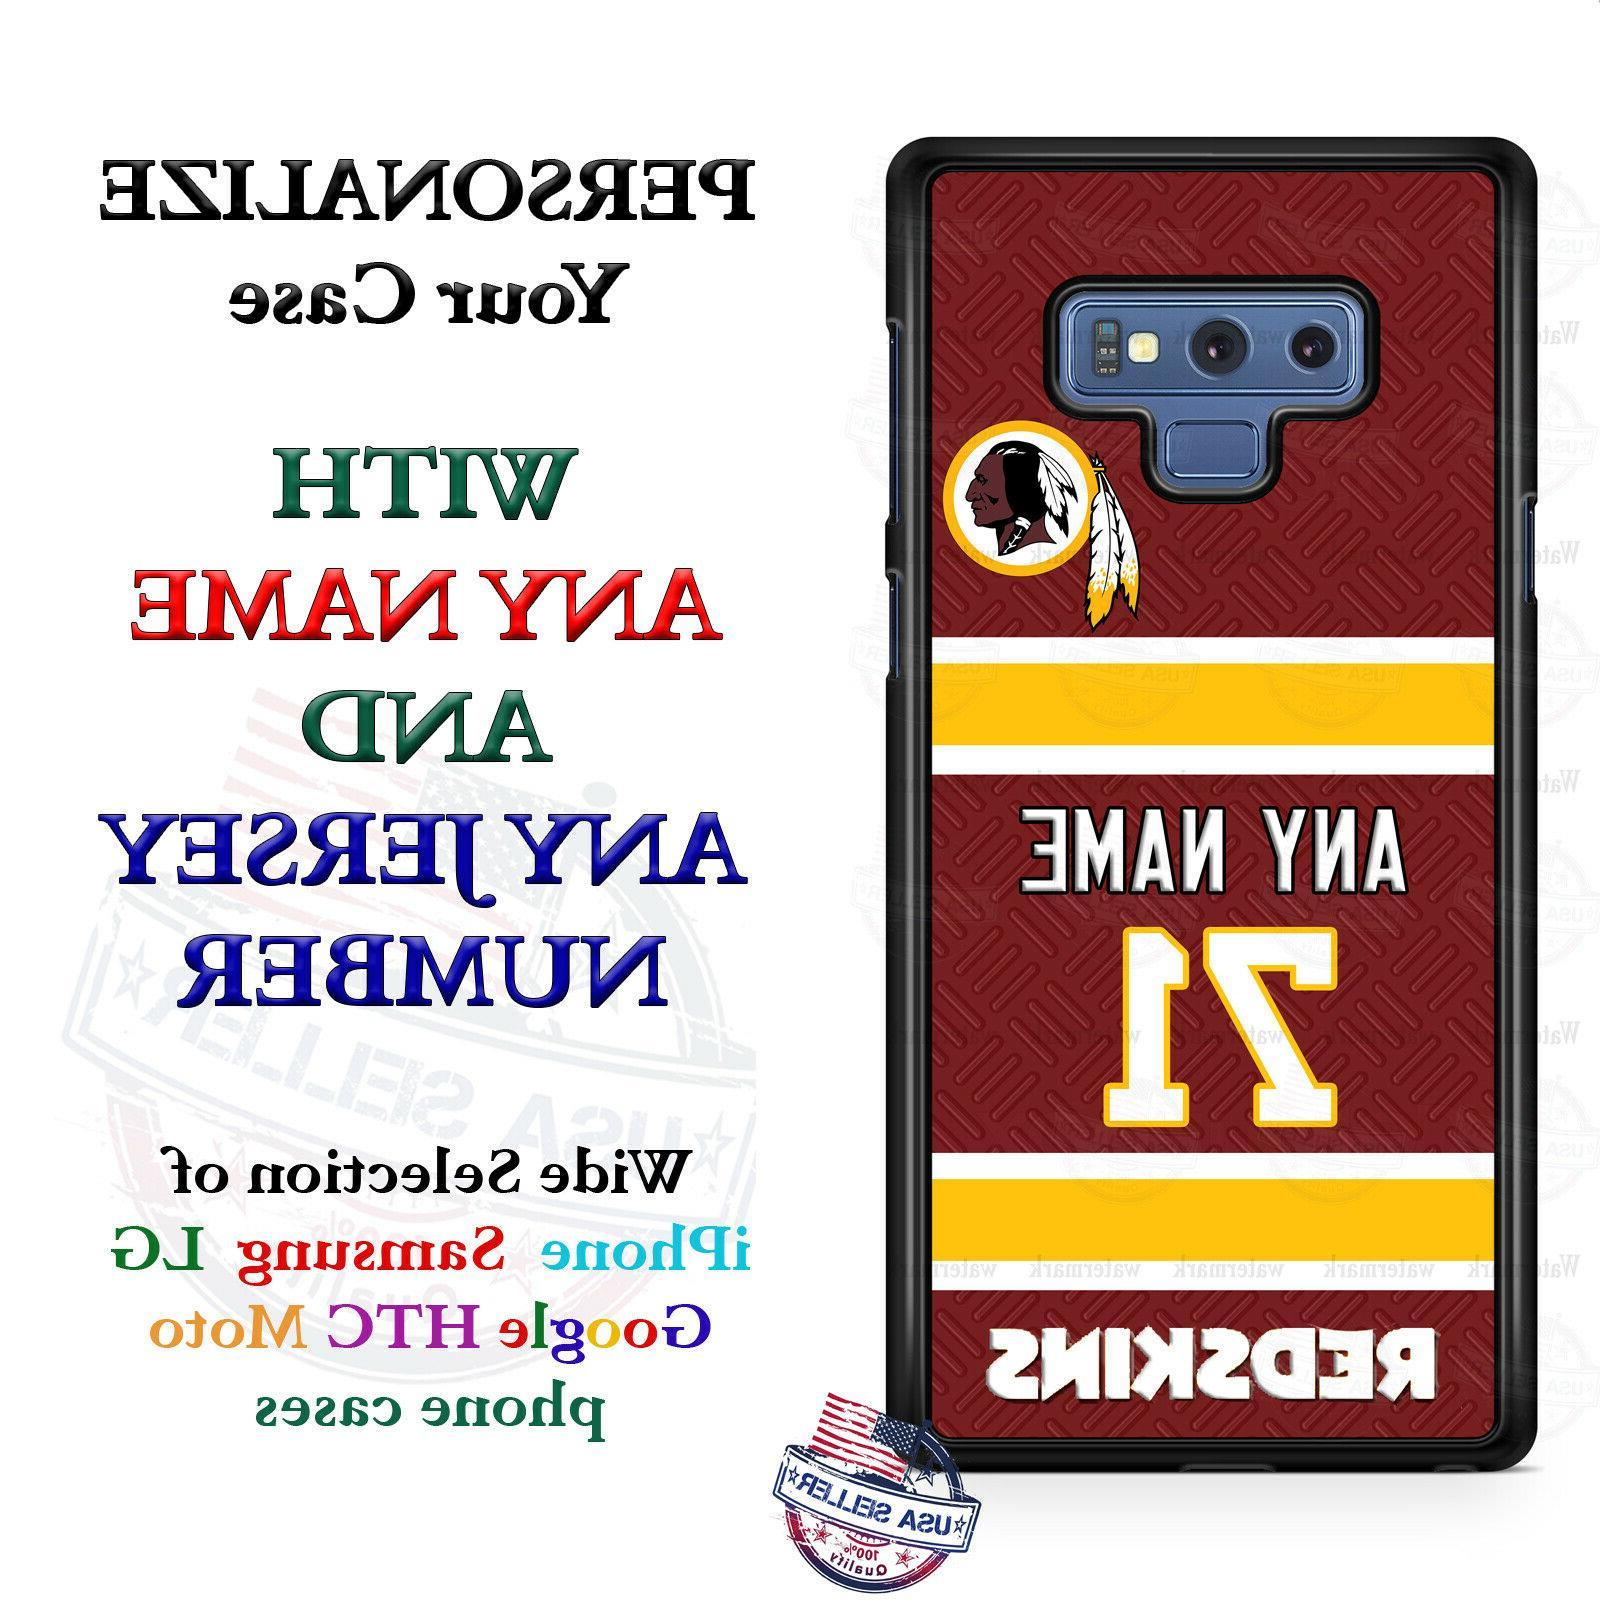 WASHINGTON REDSKINS FOOTBALL PHONE CASE FITS iPHONE SAMSUNG